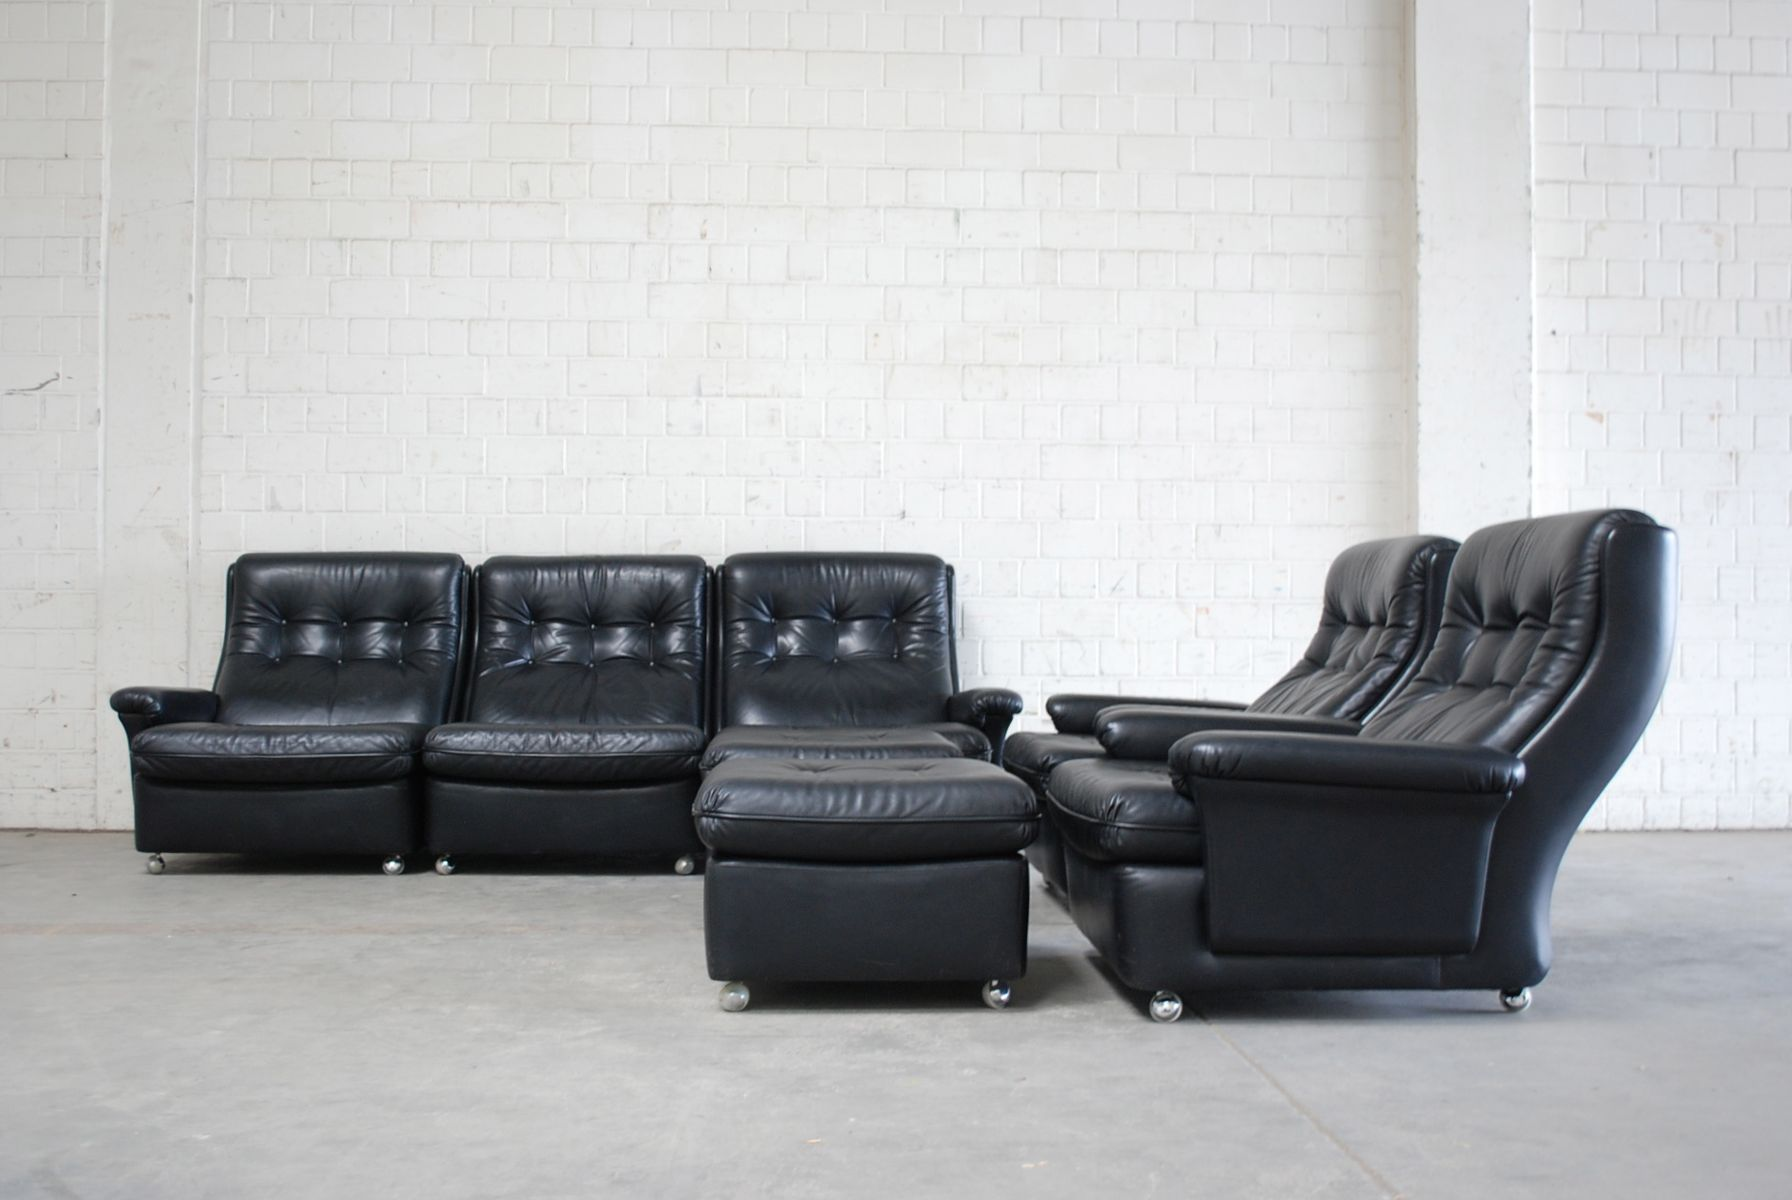 wohnzimmer garnitur ledersofa 2 sessel 2 ottomanen von profilia 1970er 5er set bei pamono. Black Bedroom Furniture Sets. Home Design Ideas